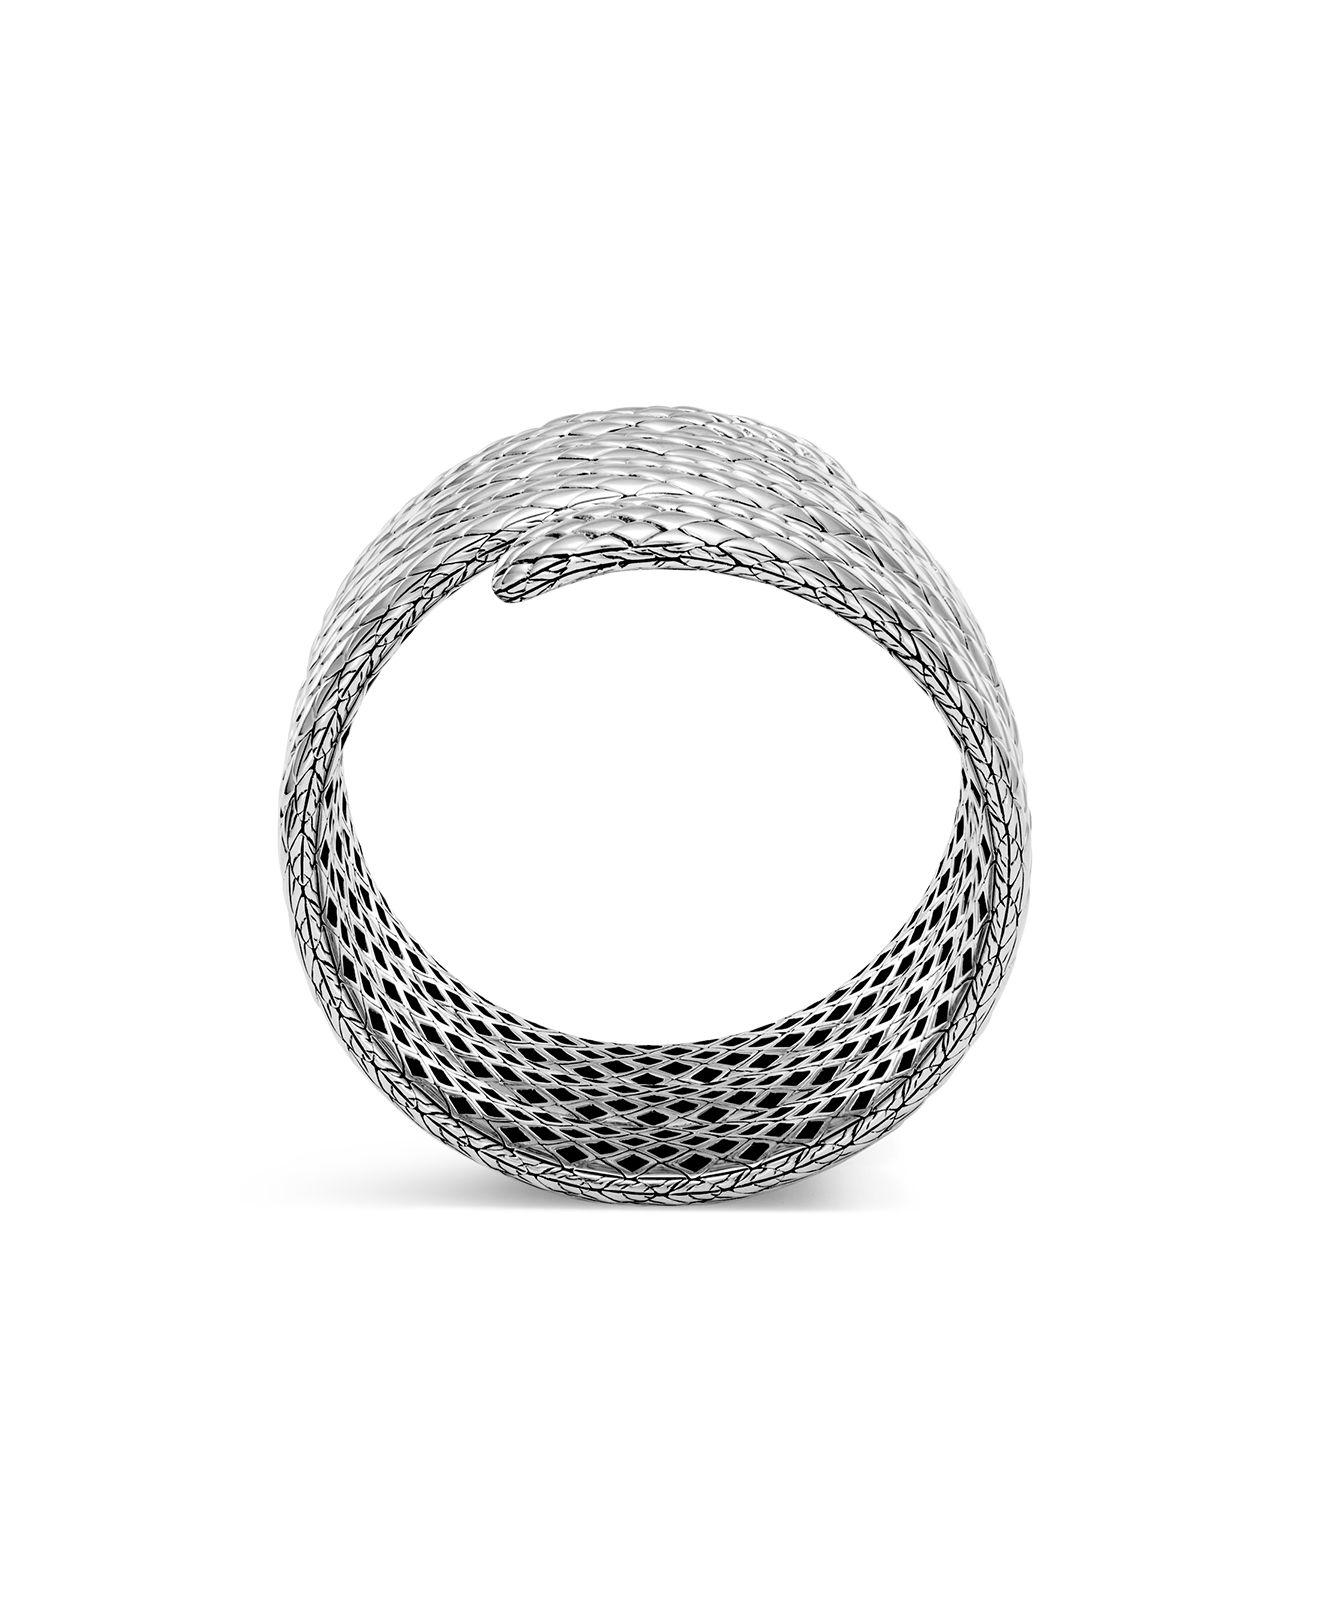 John Hardy Legends Cobra Collection Multiple Coil Bracelet in Silver (Metallic)